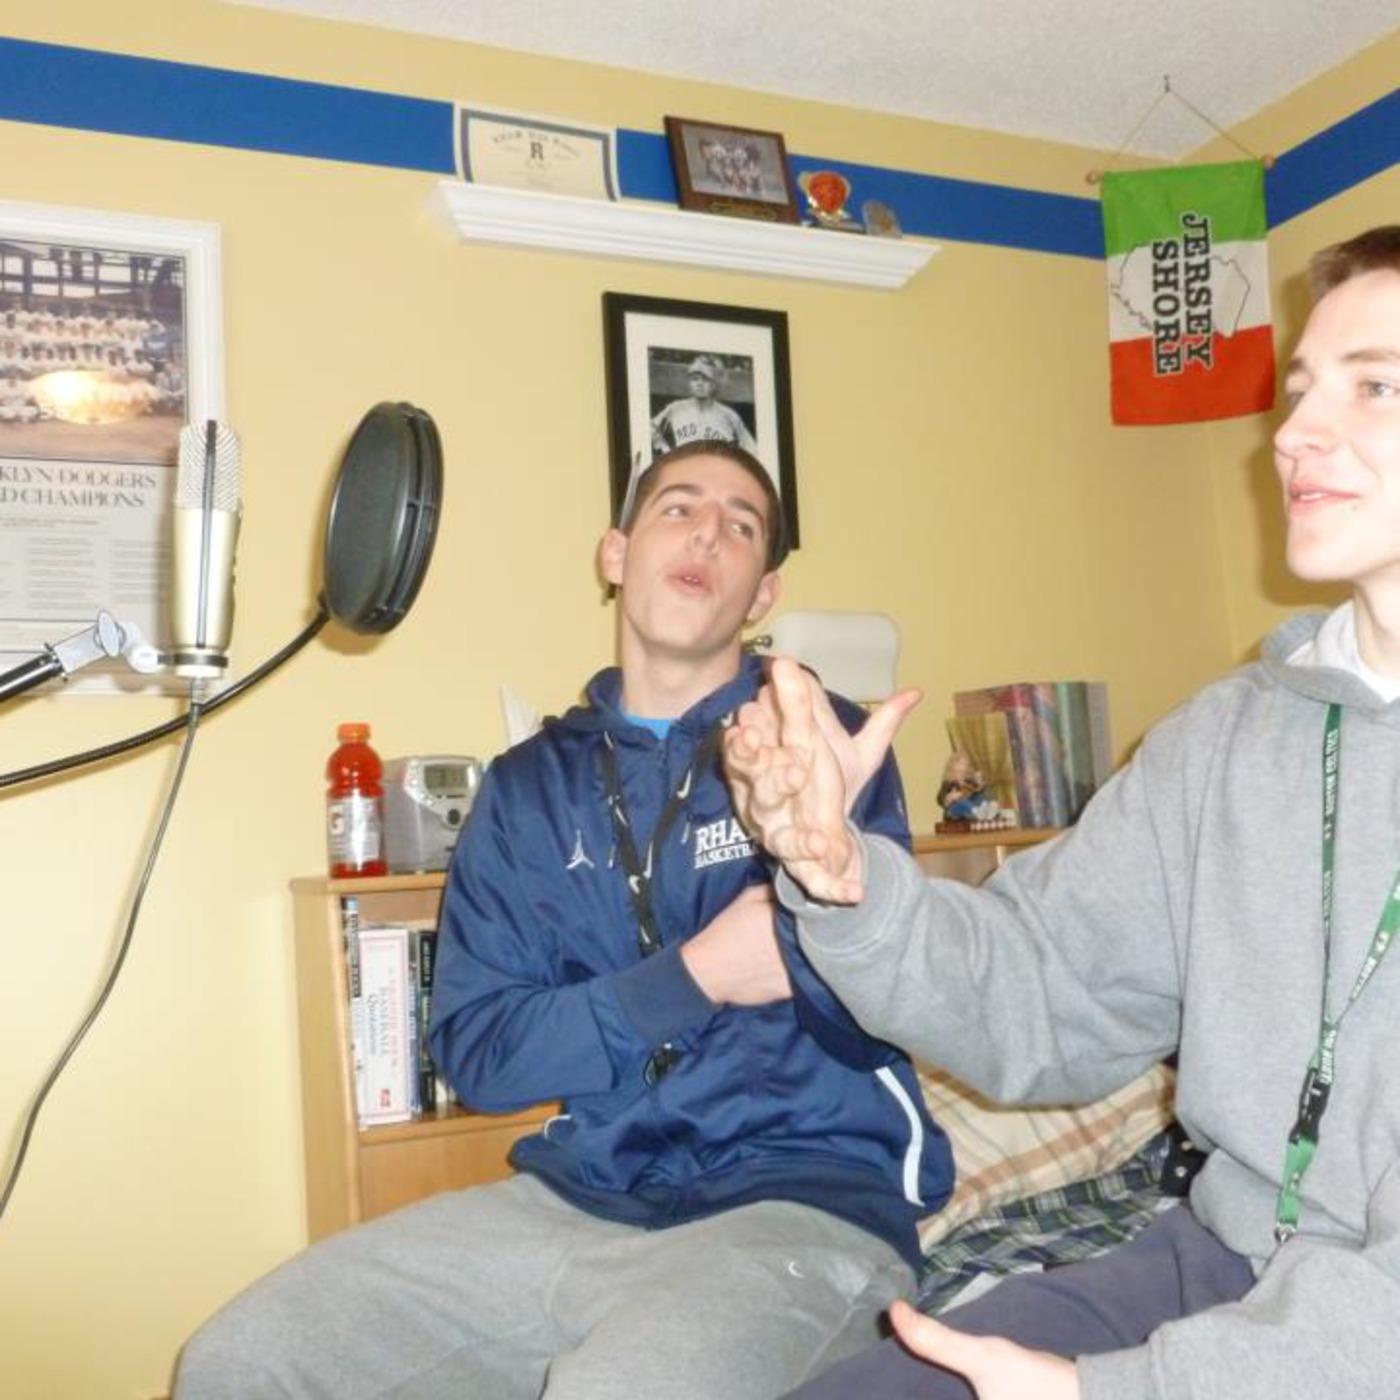 Burke and Ian